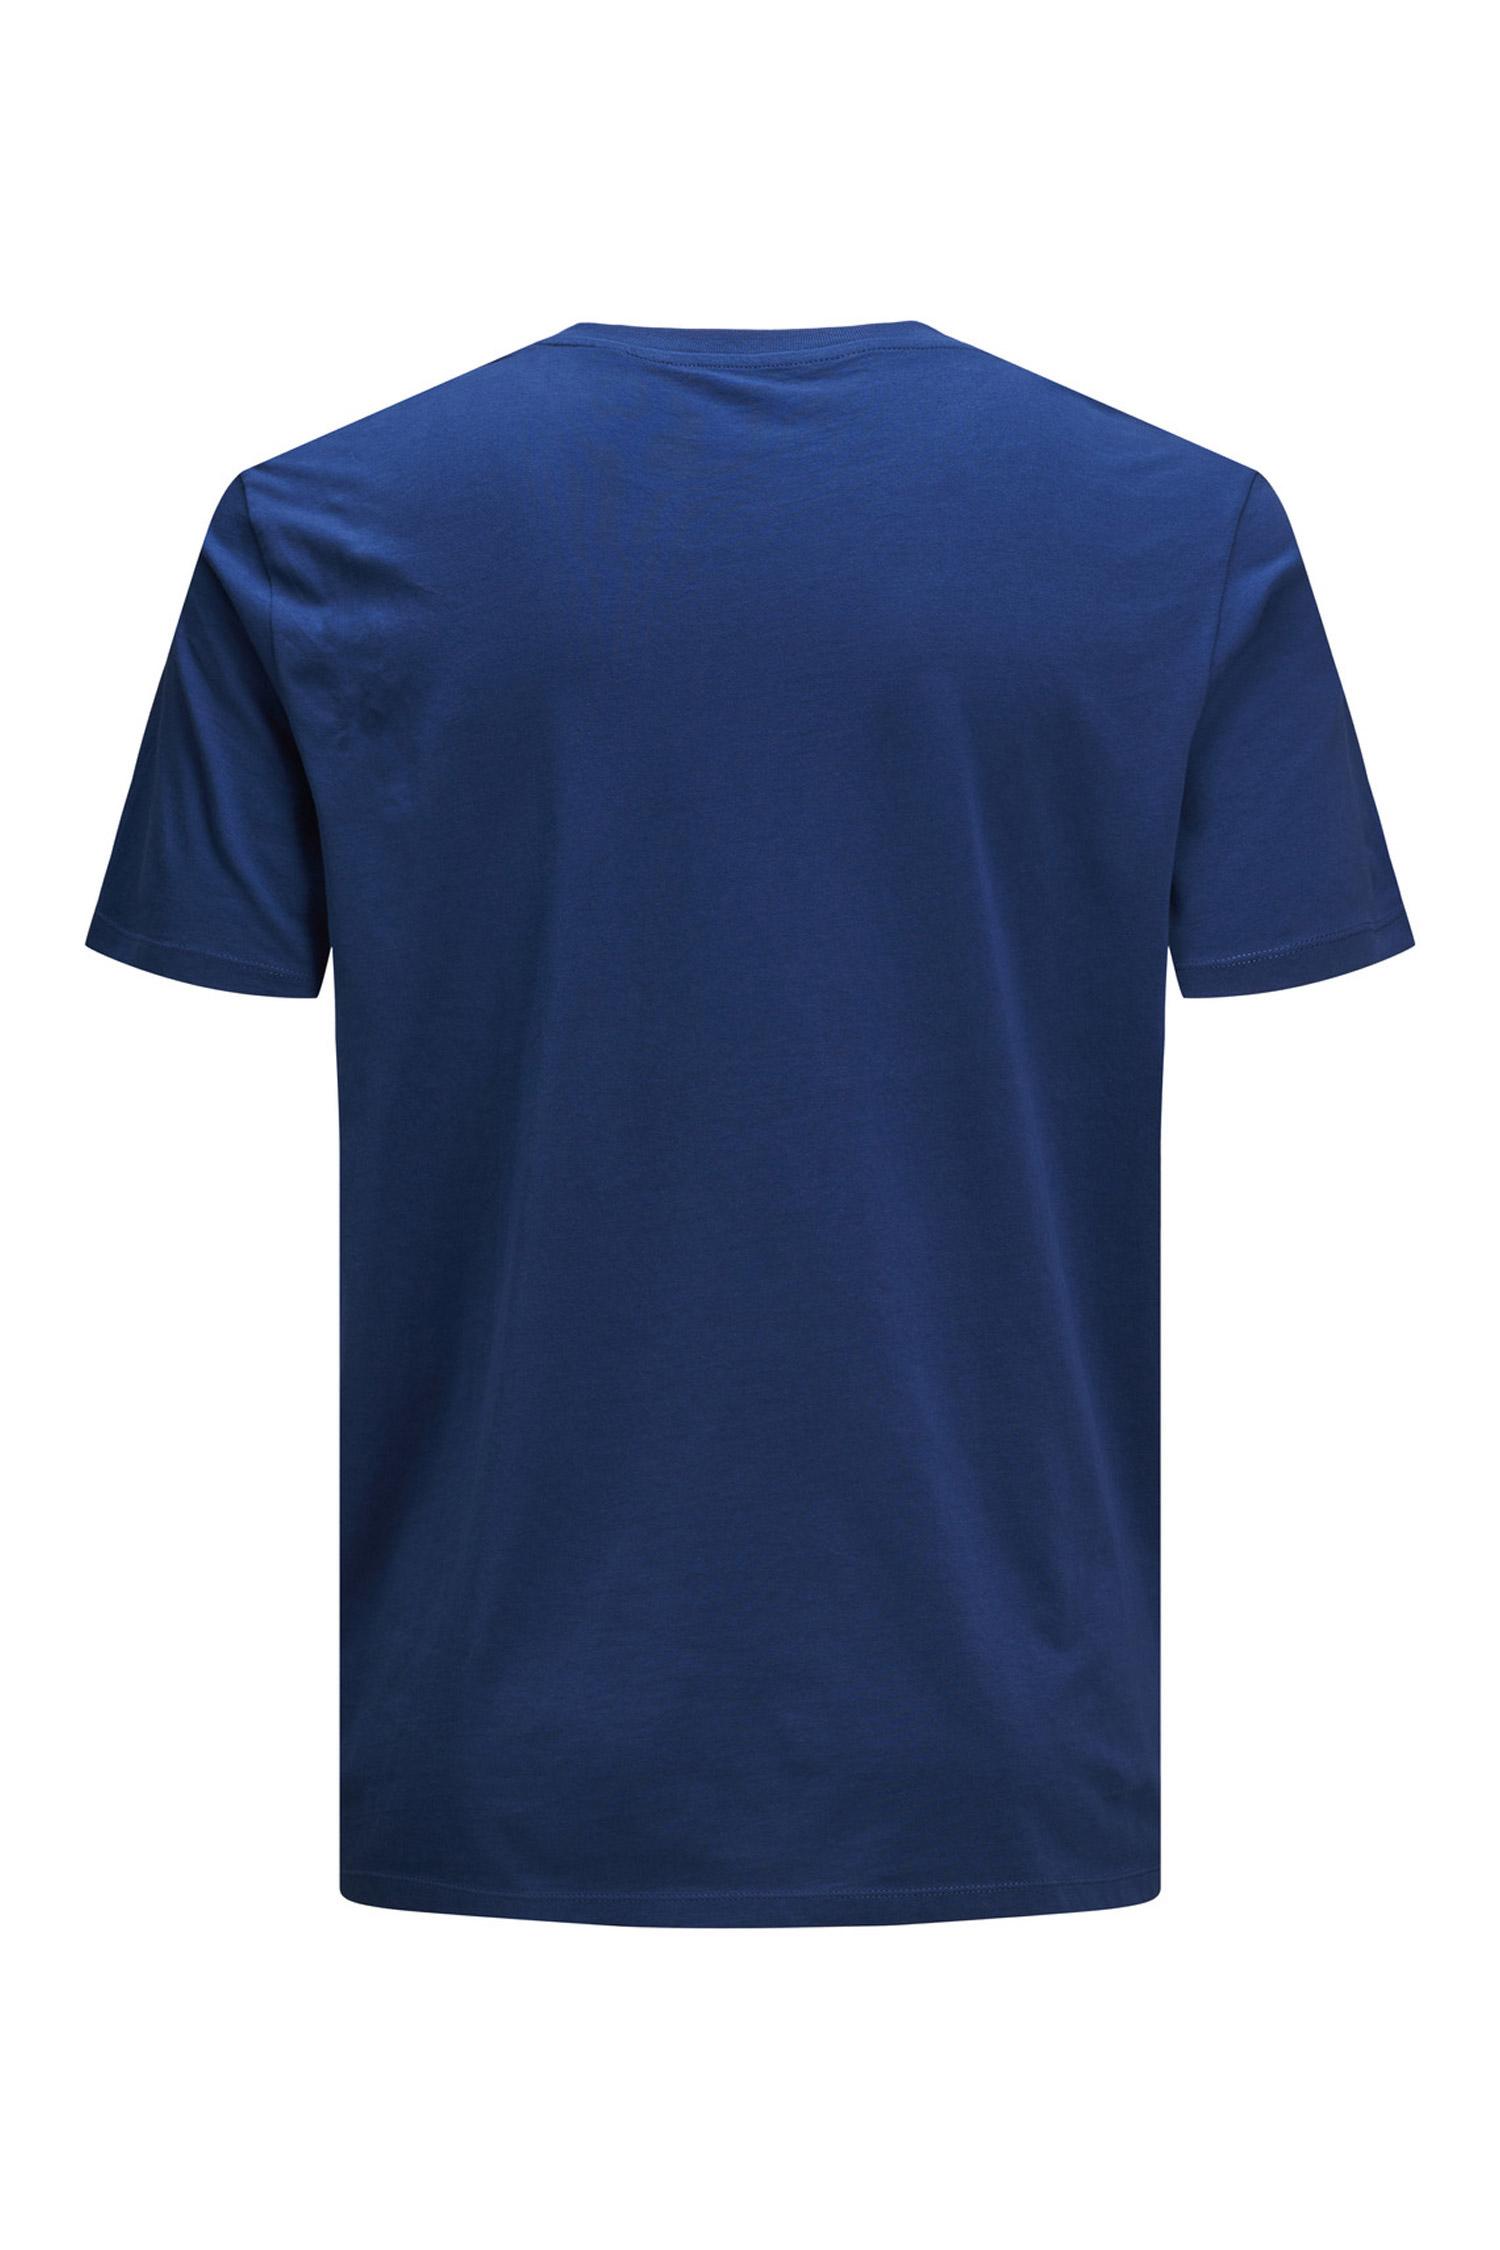 Sport, Camisetas M. Corta, 110080, MARINO | Zoom